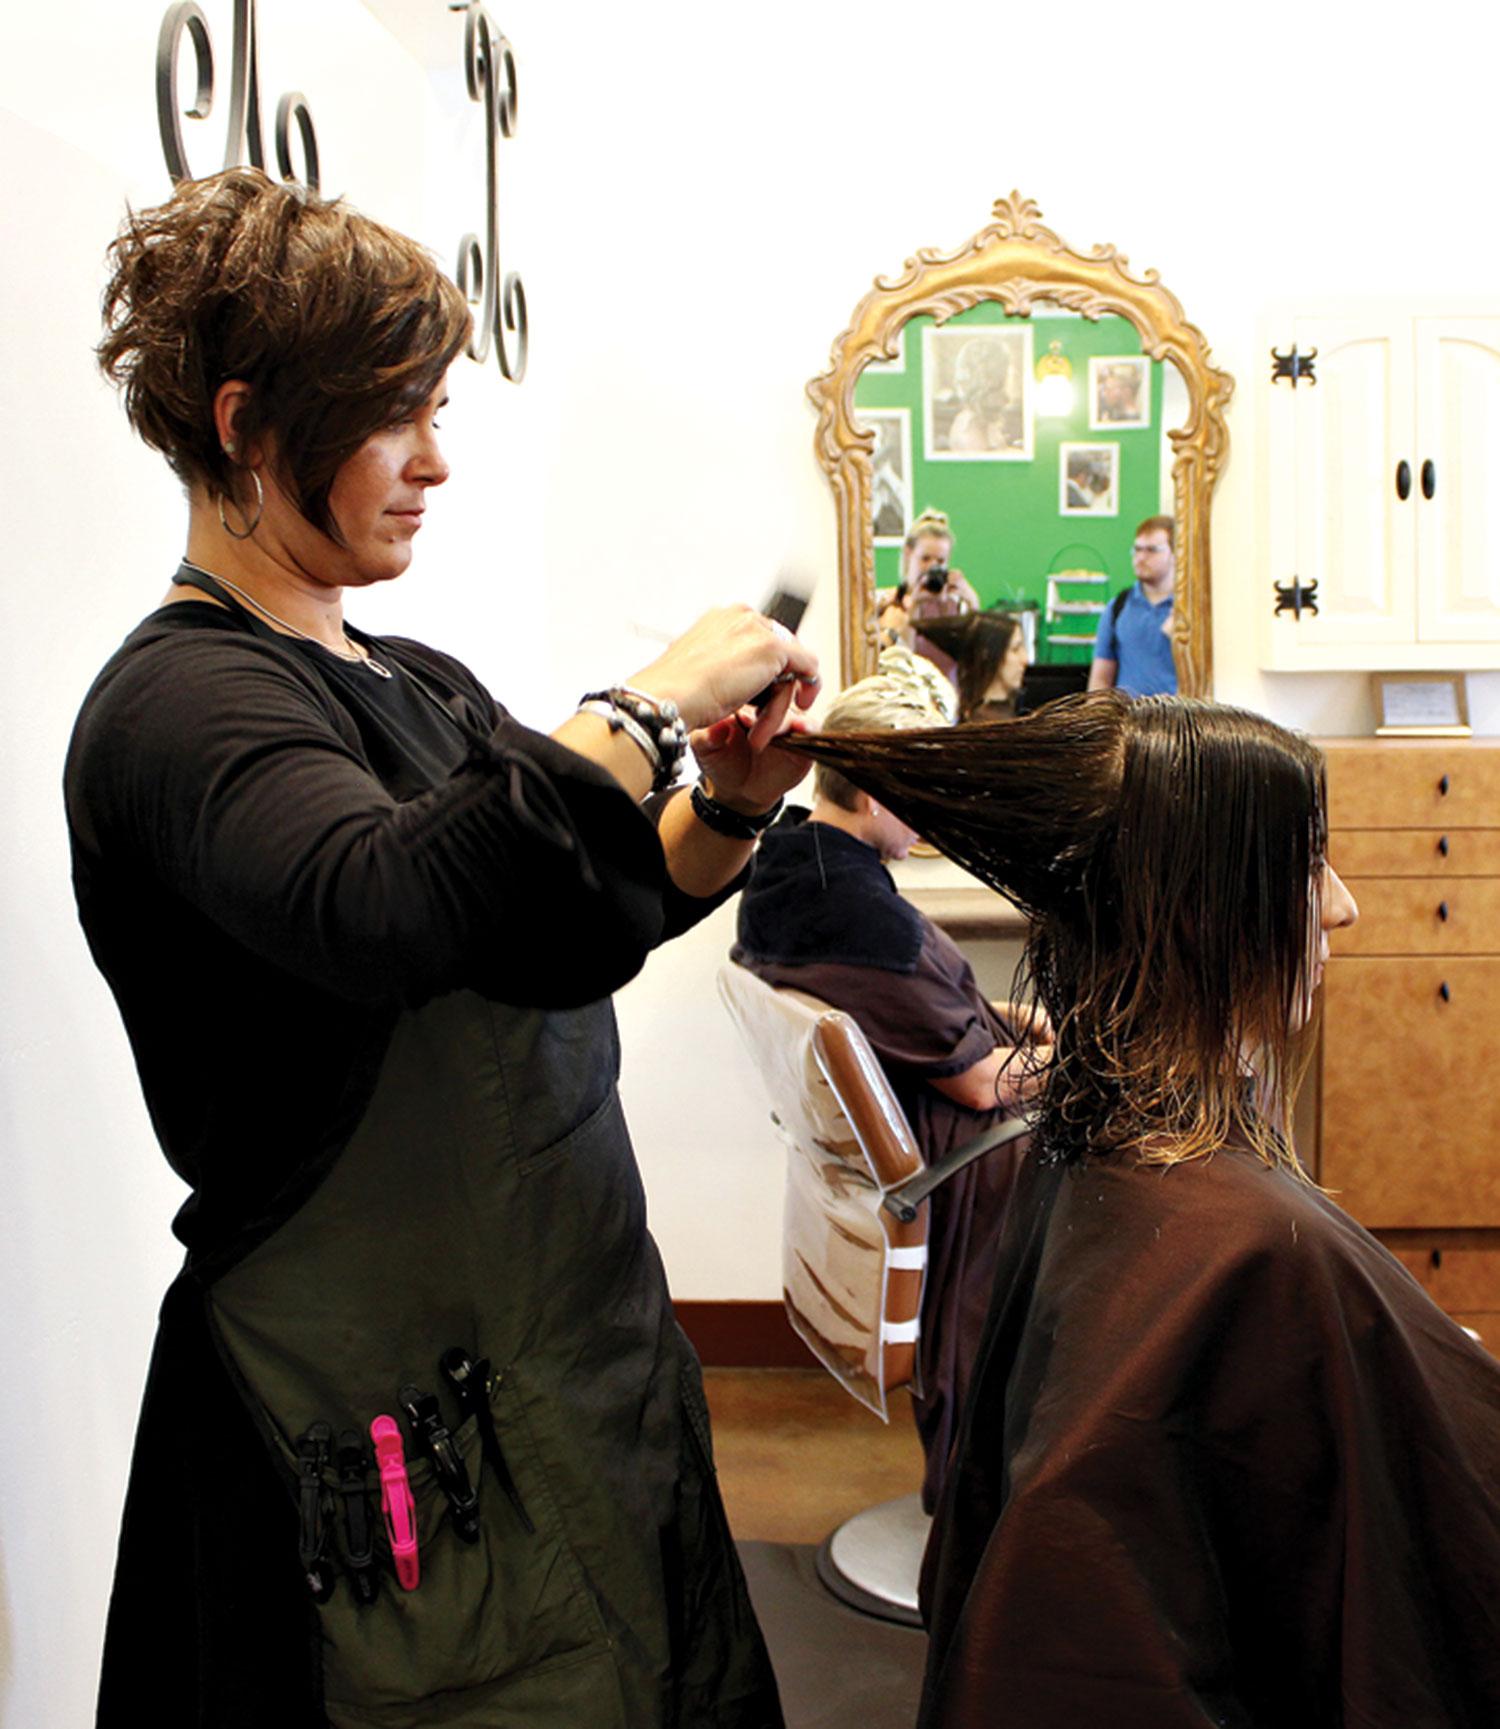 Leidan Mitchell Salon; photos by Harper Speagle-Price